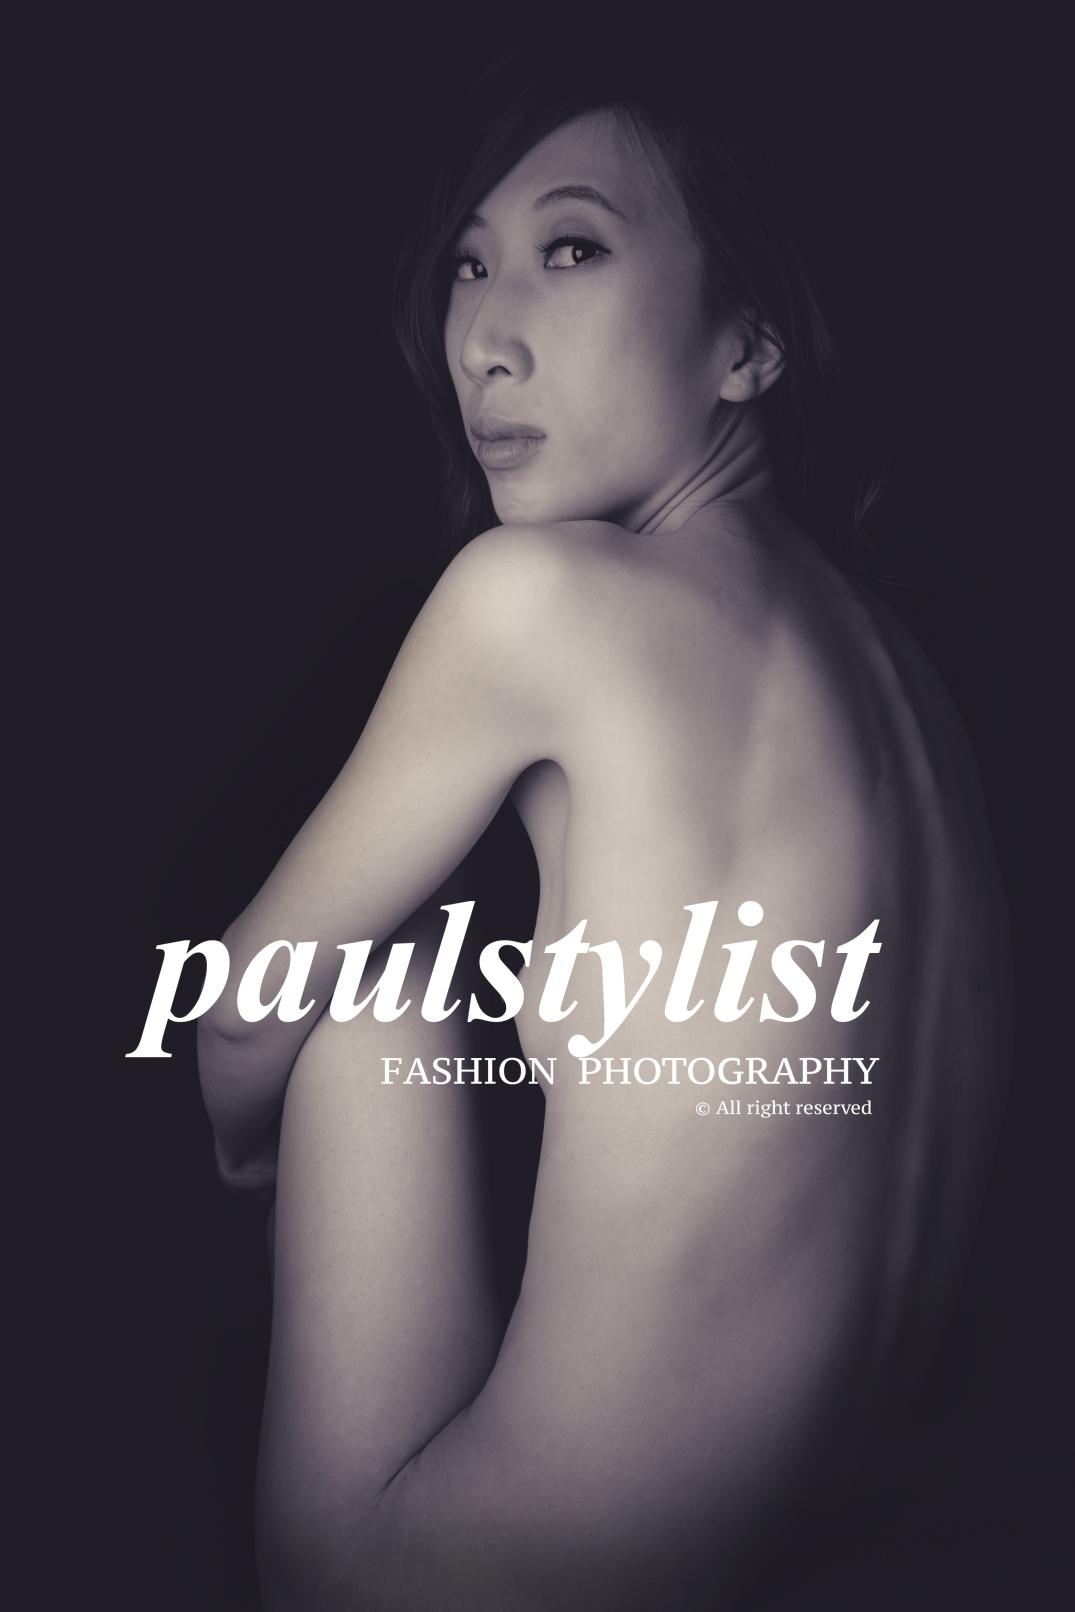 moody nude portrait photography HK by paulstylist-9logo